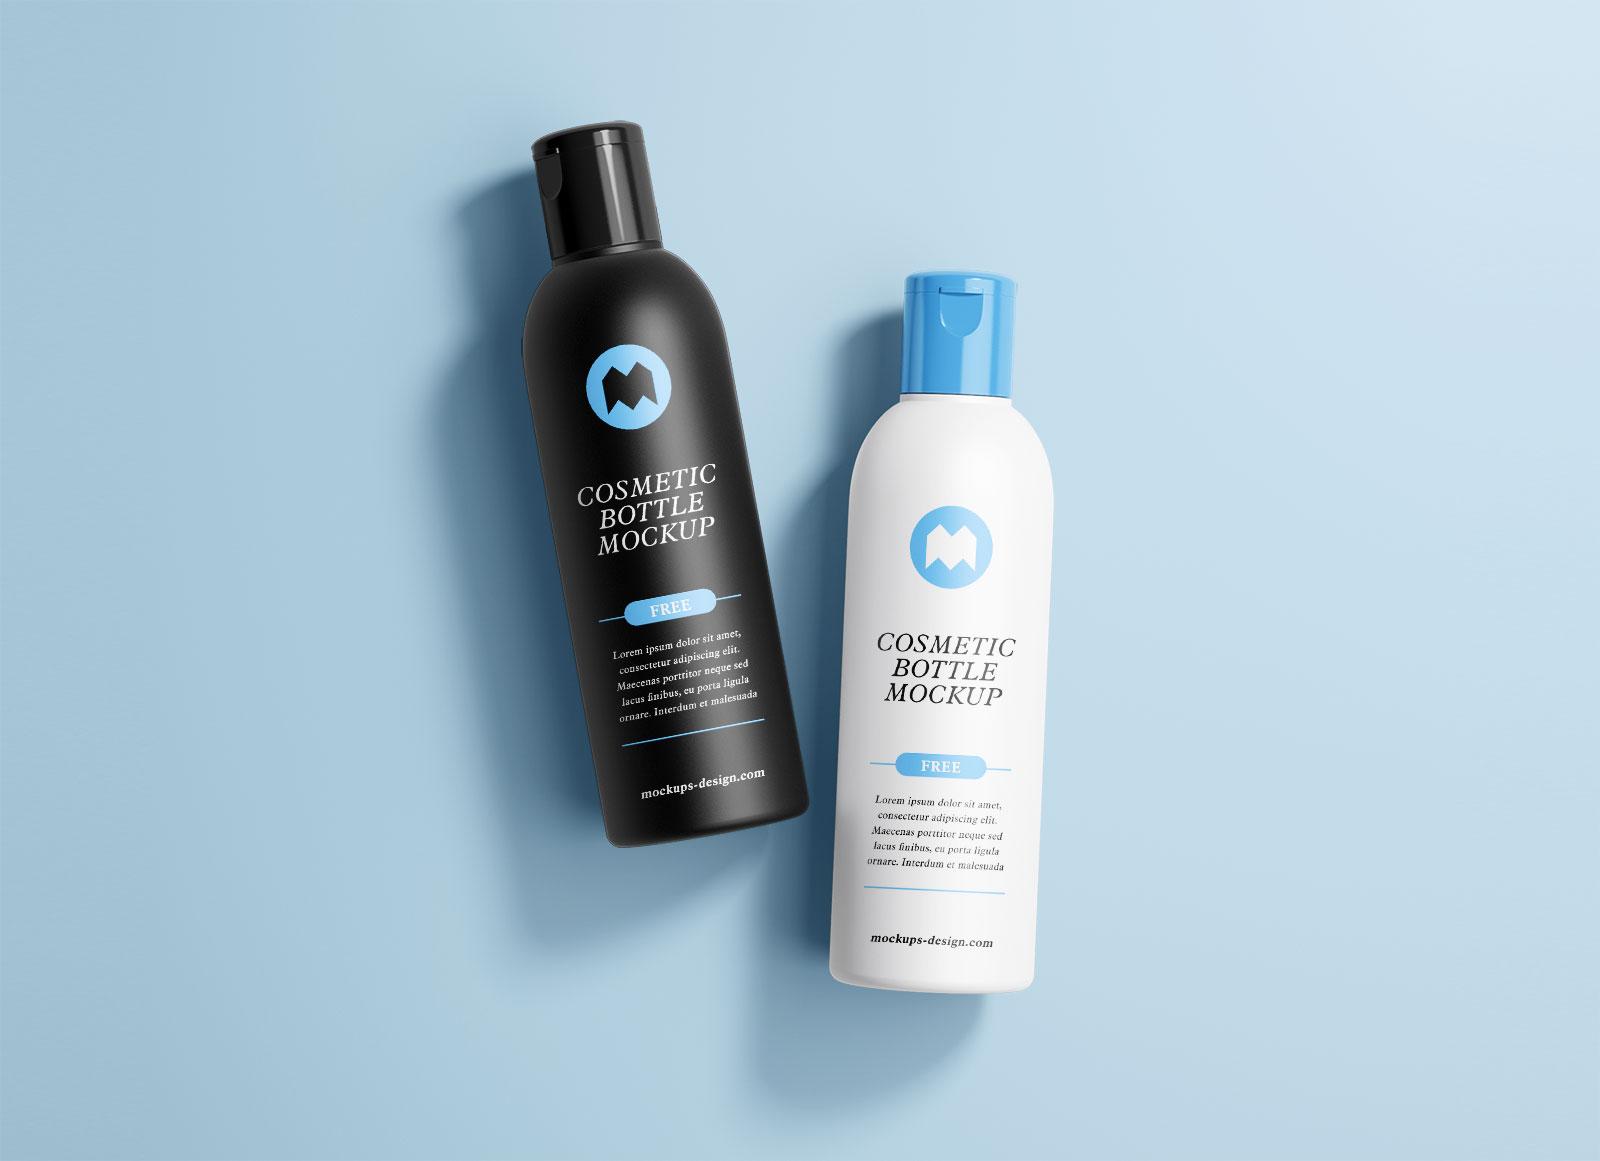 Free-Cosmetic_Cream-Oil-Bottle_Mockup_PSD-Set-2